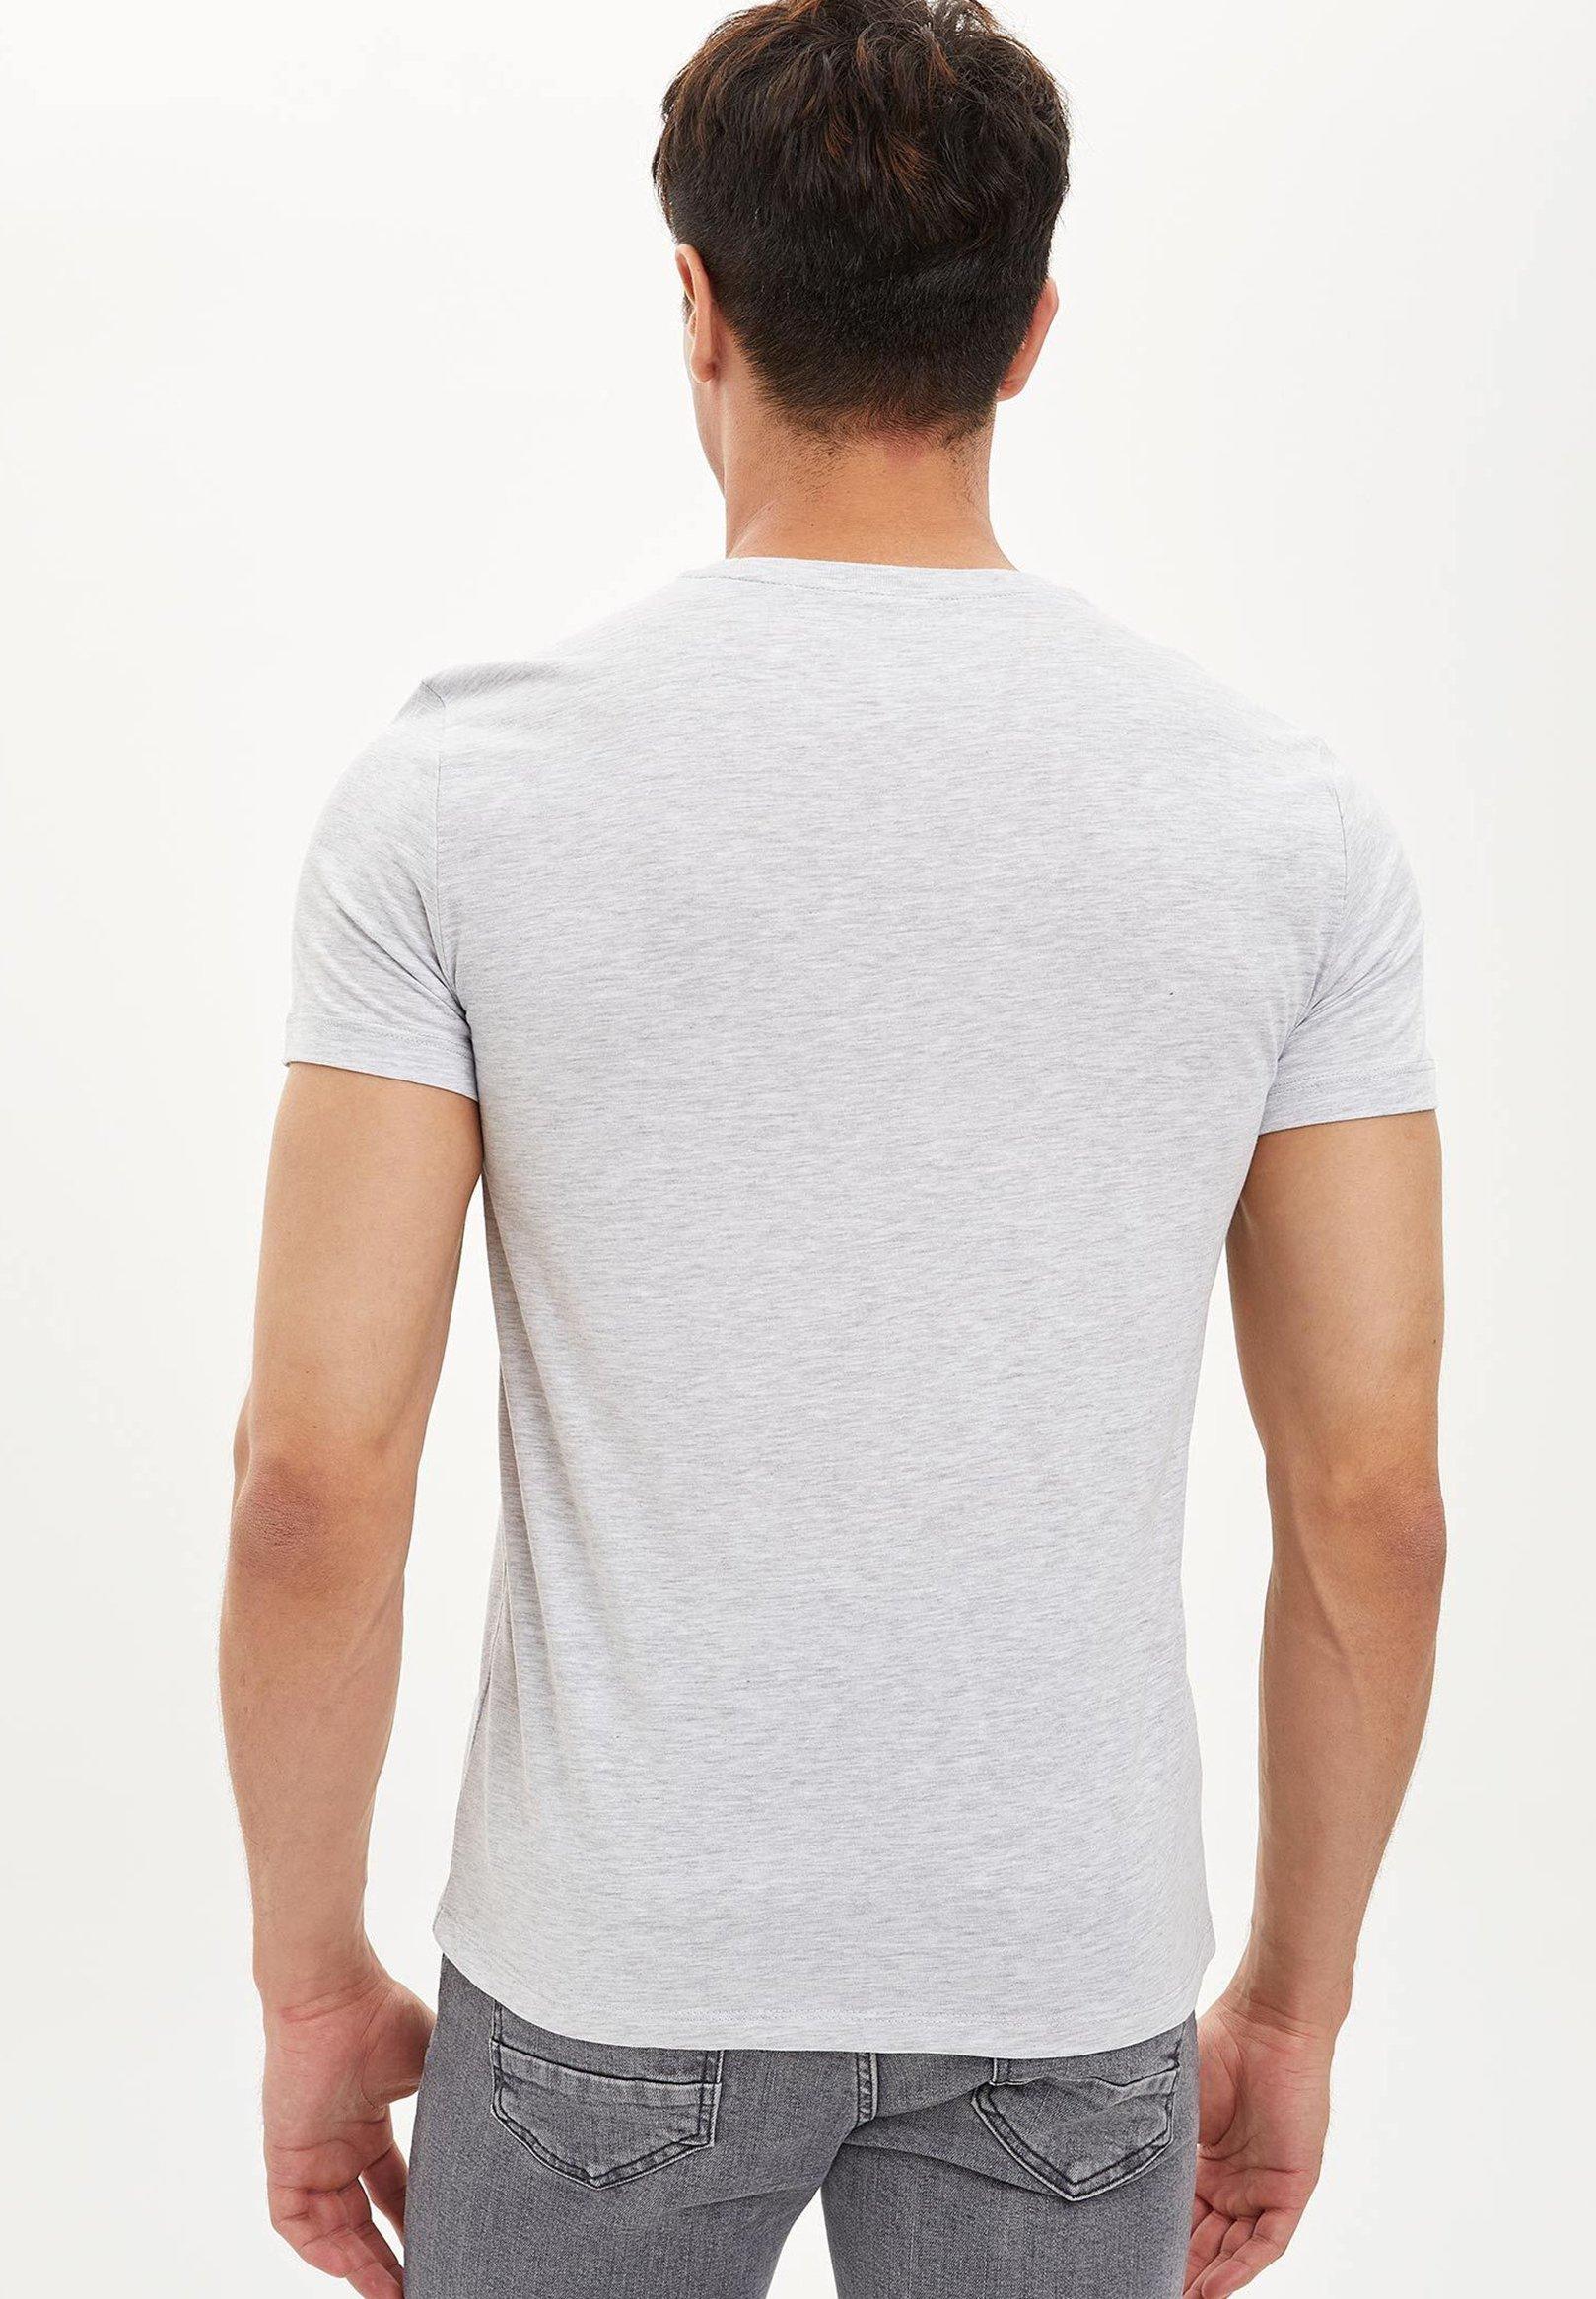 DeFacto Print T-shirt - grey euTvs